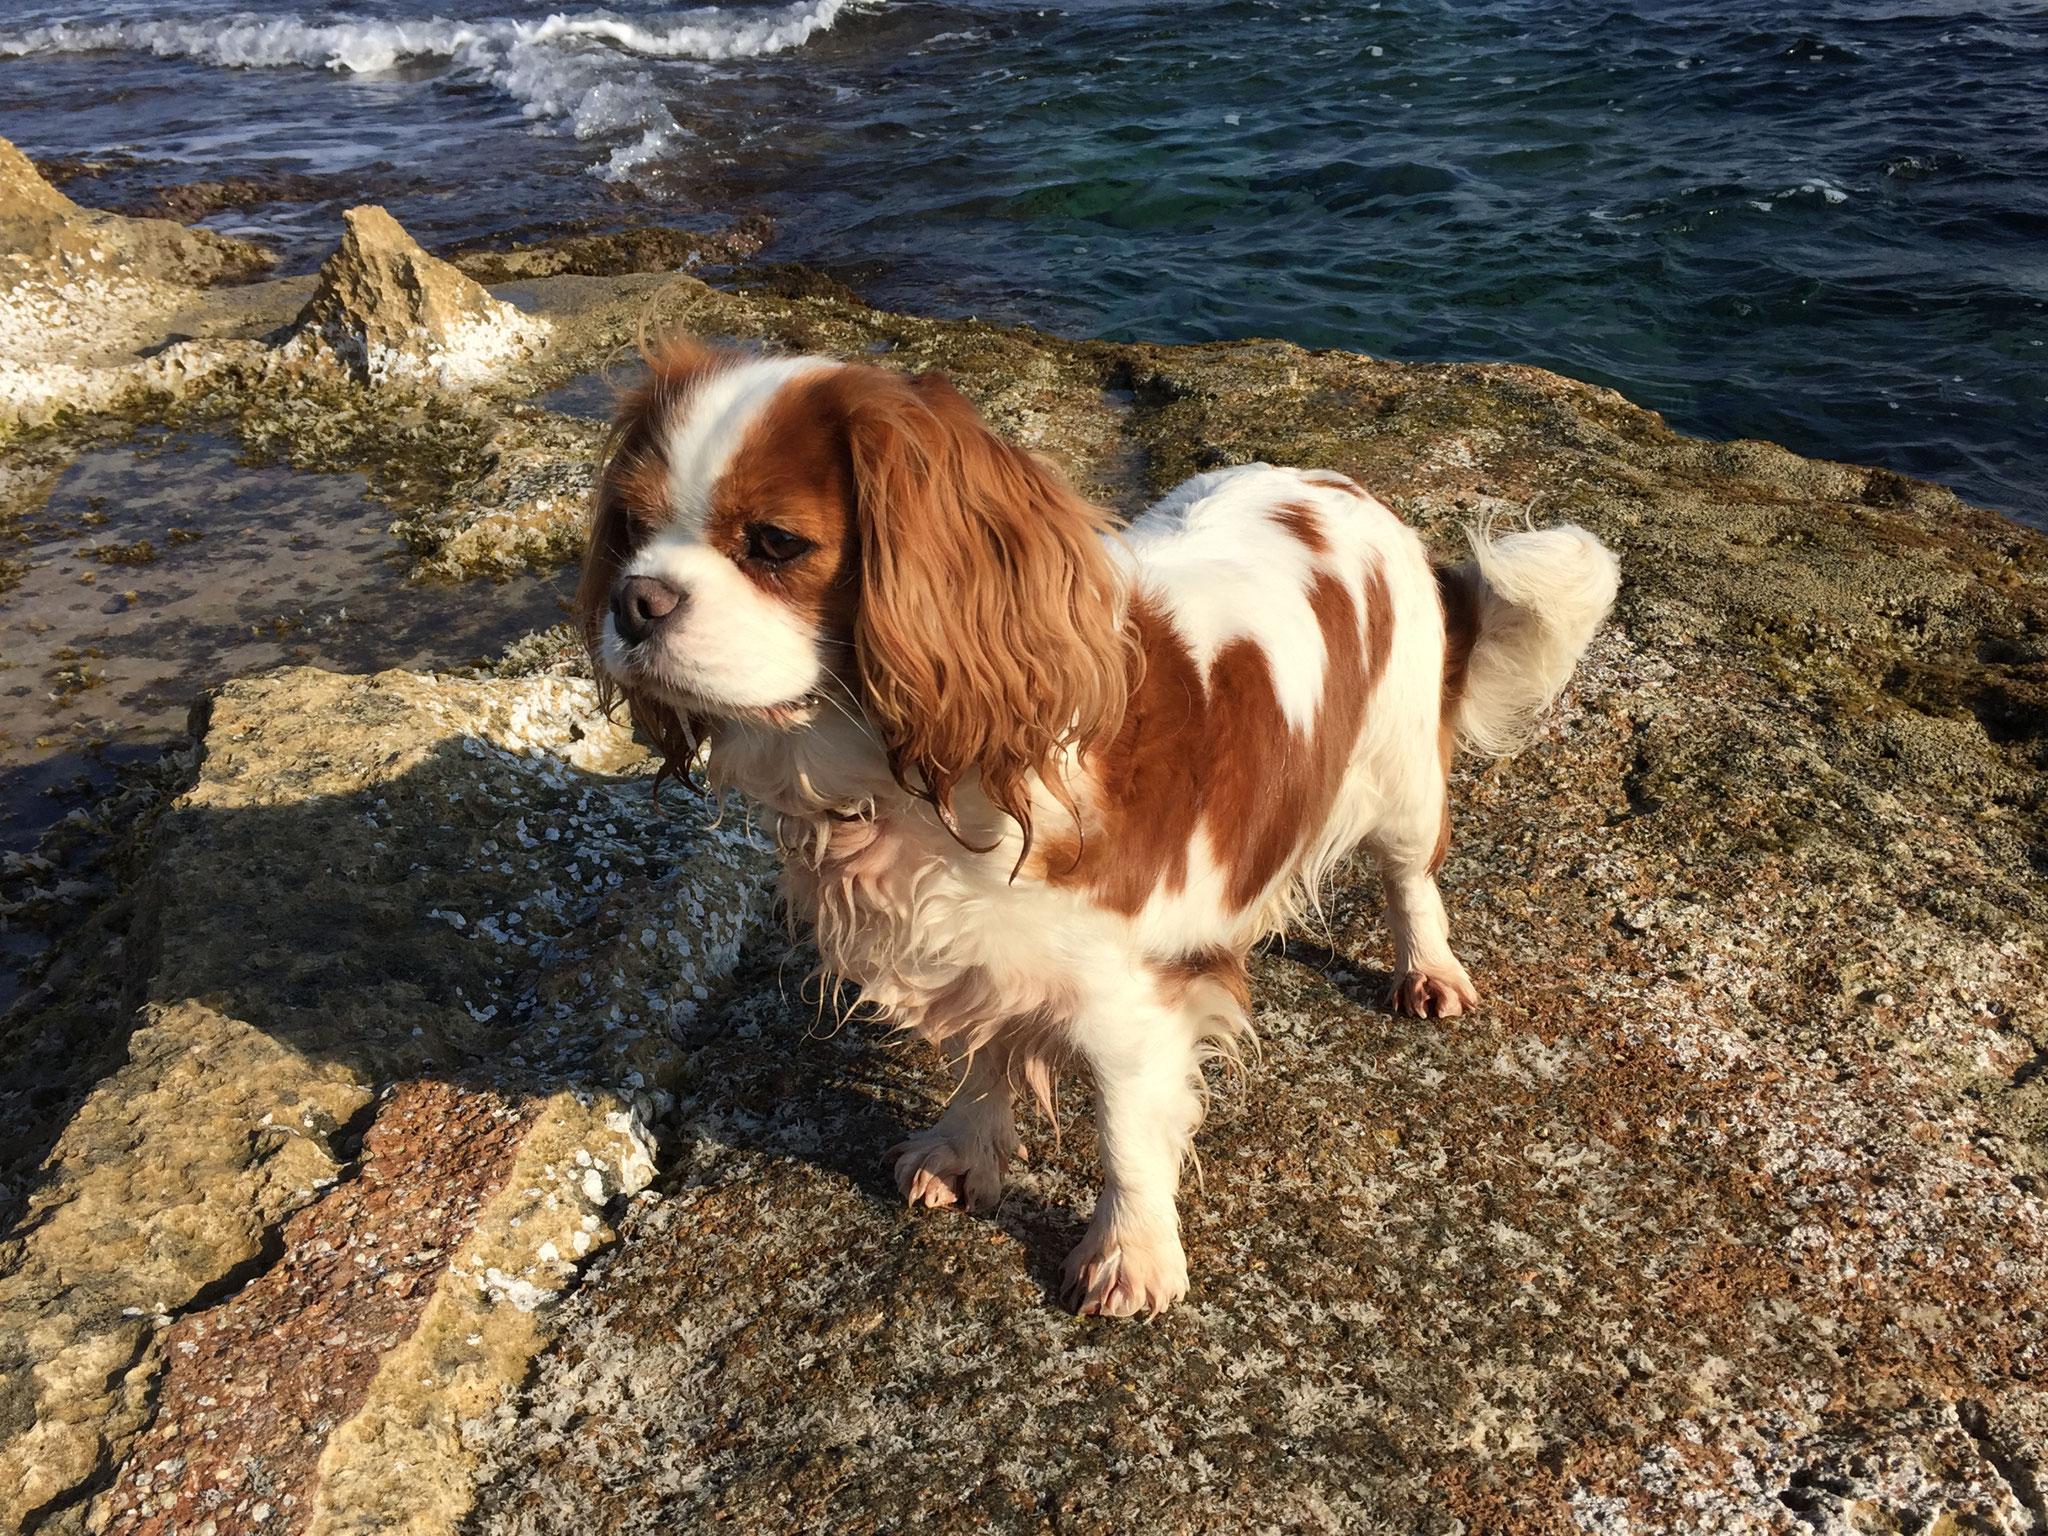 Keira liebet das Meer in Spanien!